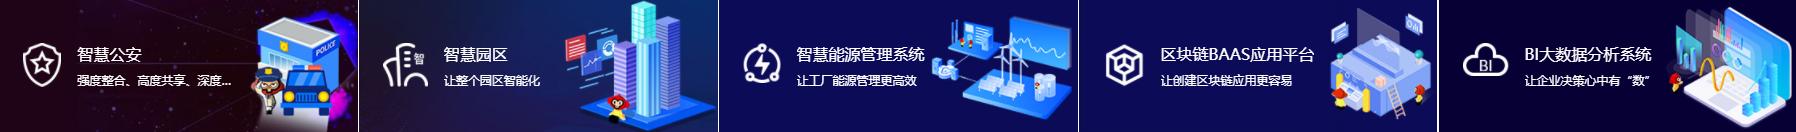 QQ截图20200223183155.png